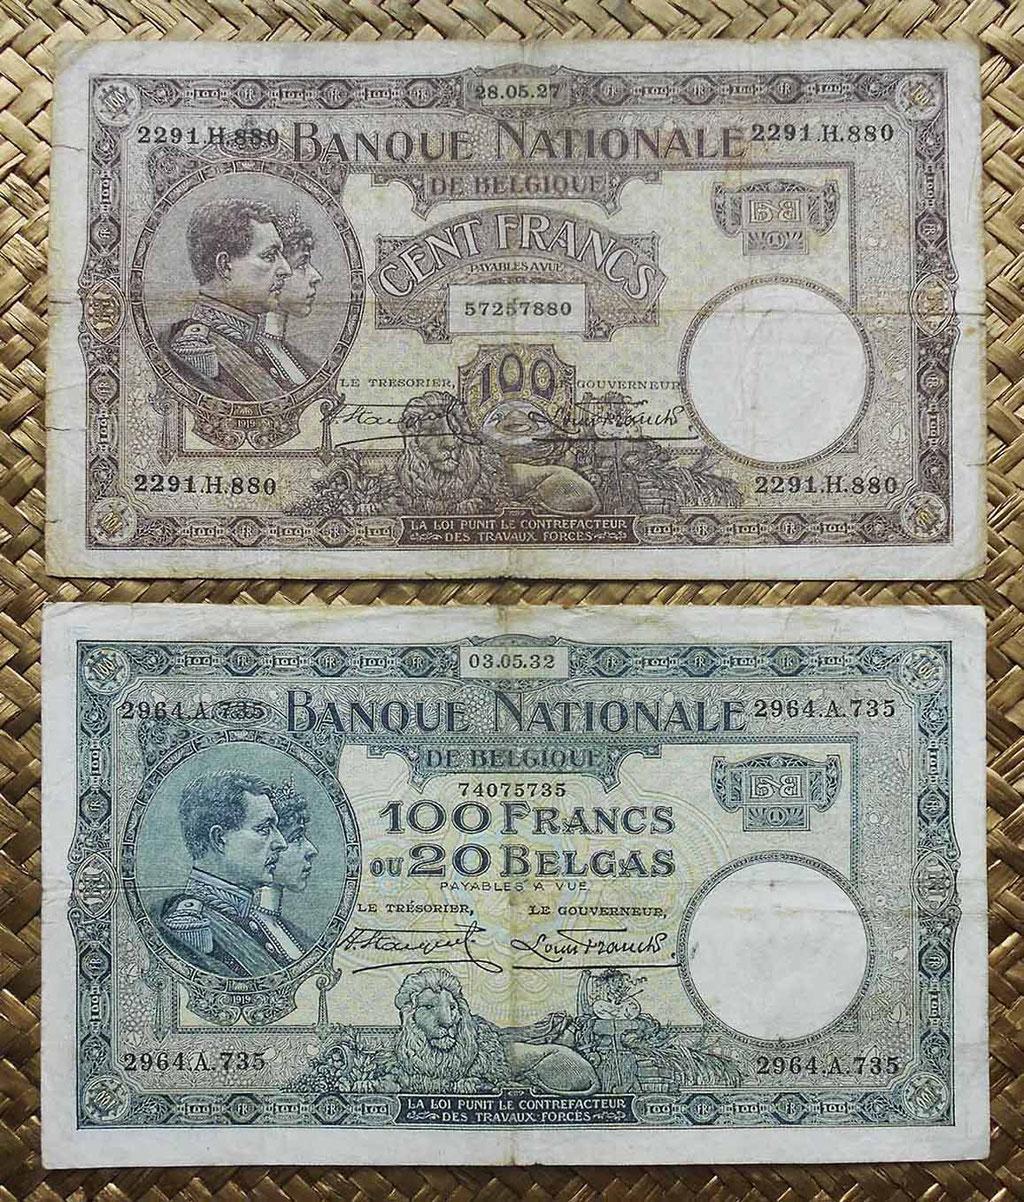 Bélgica 100 francos 1927 vs 100 francos-20 belgas 1932 anversos